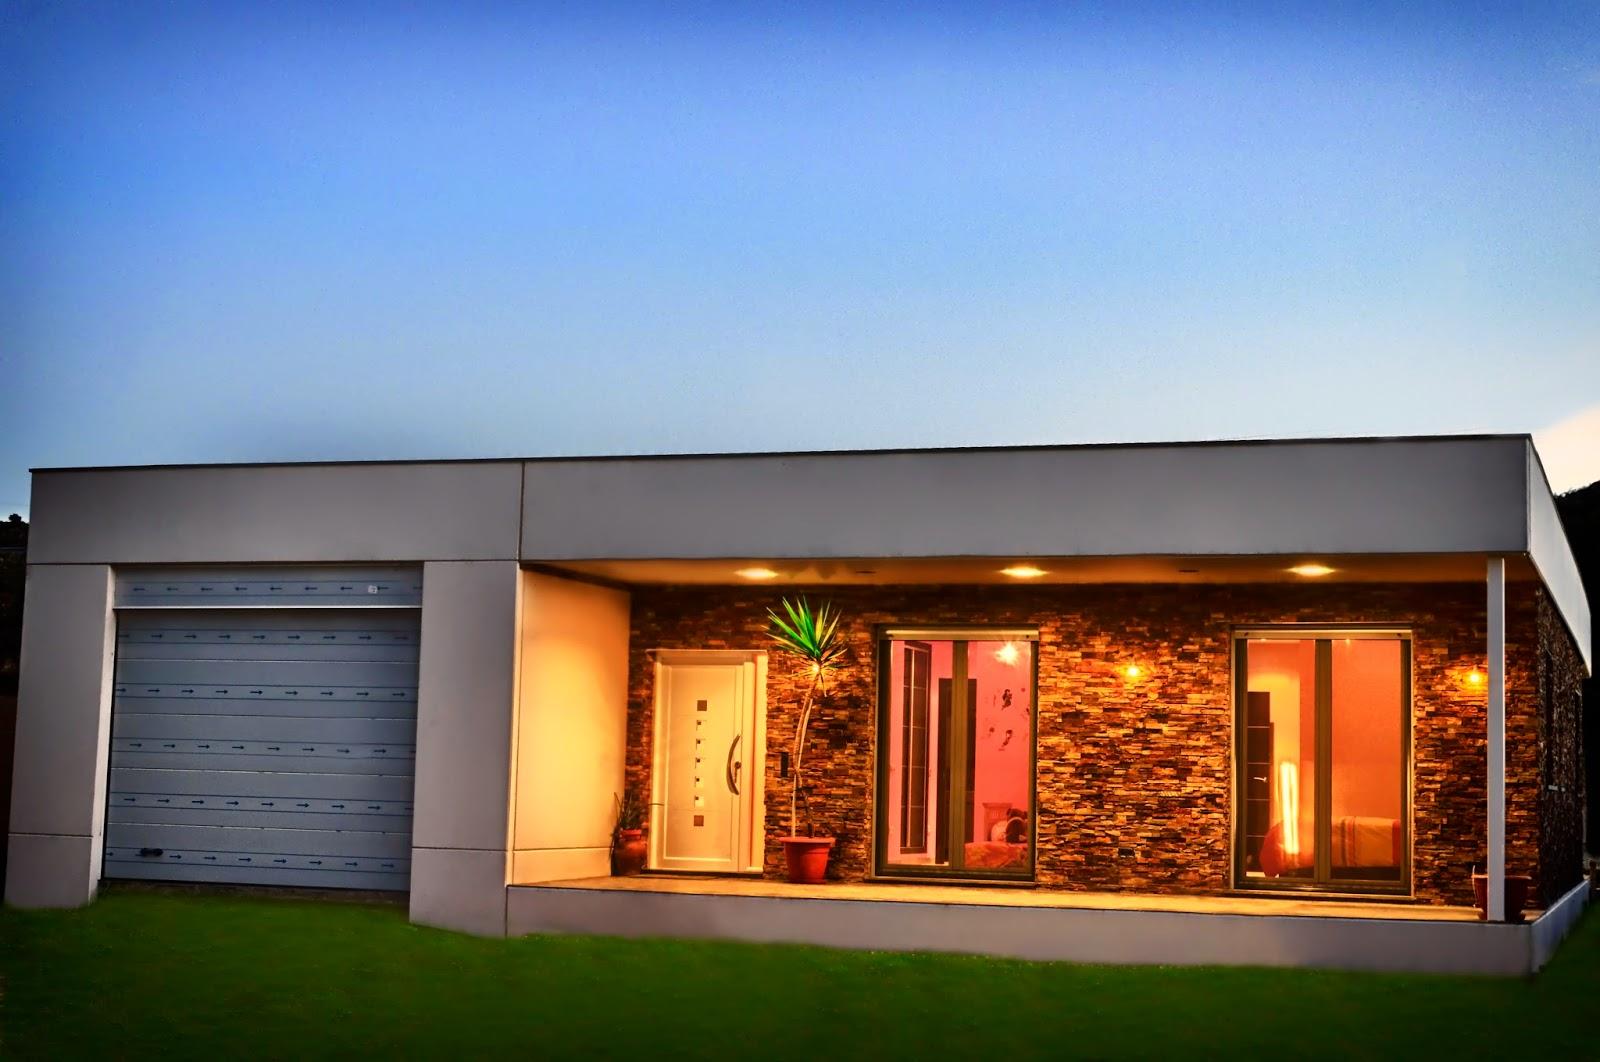 Casas de madera prefabricadas chalets prefabricados for Costo casa prefabricada